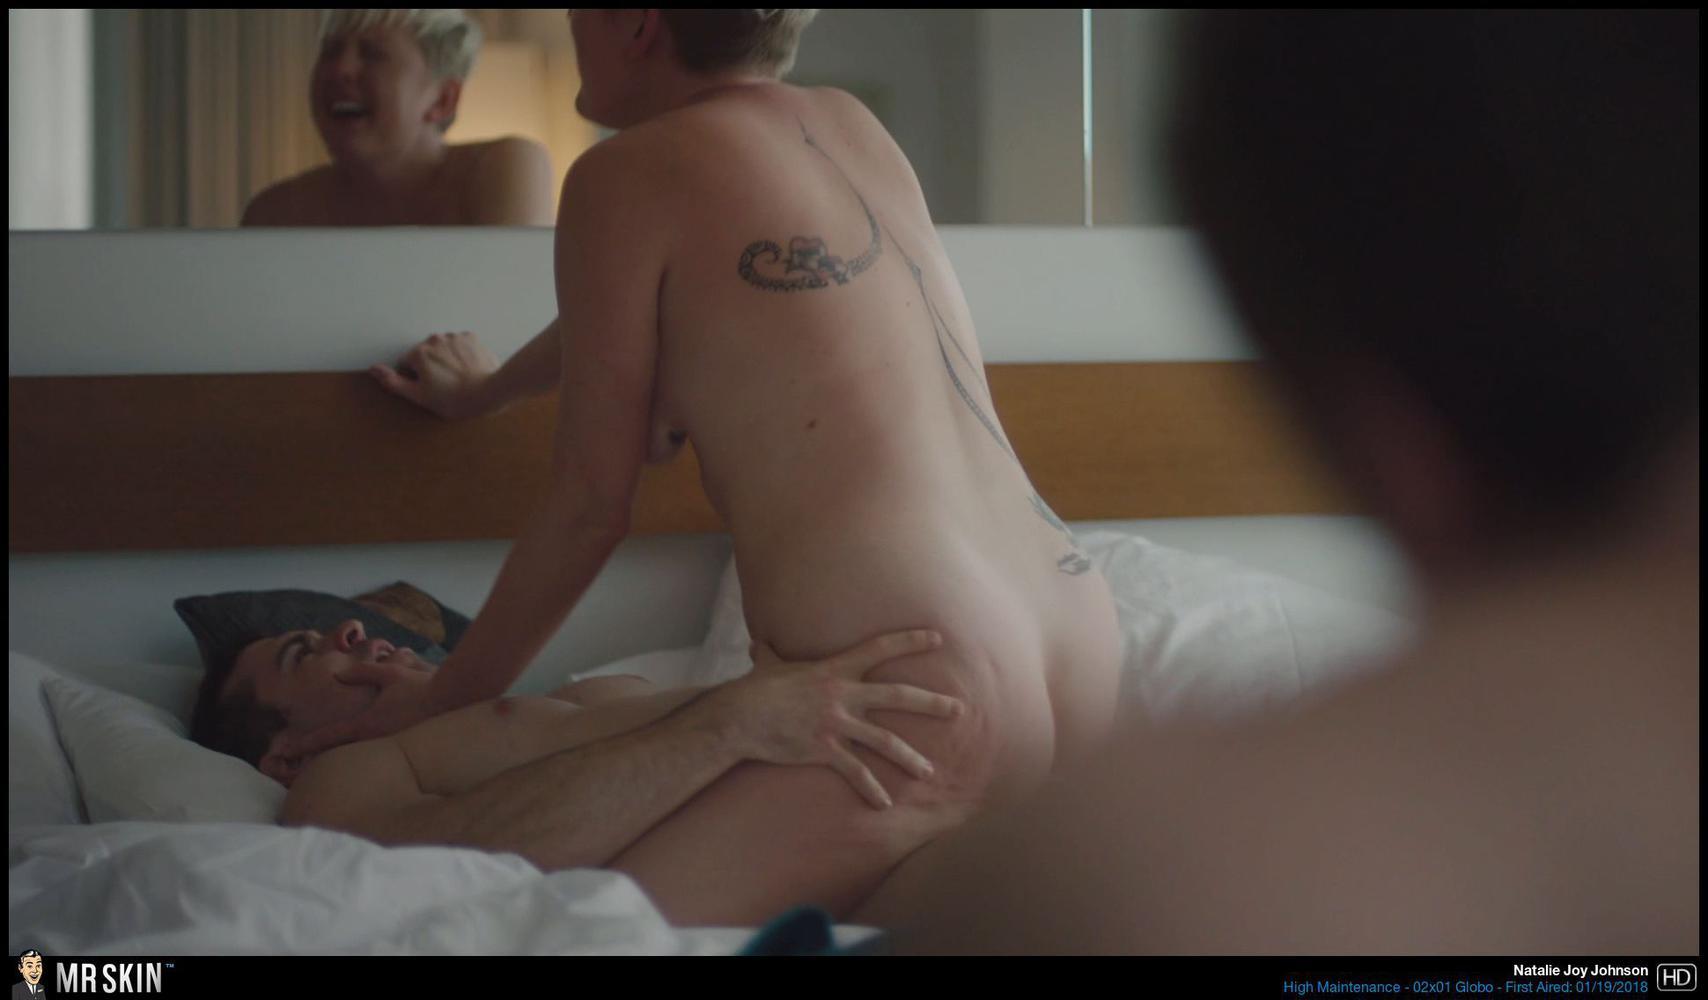 High maintenance wife naked